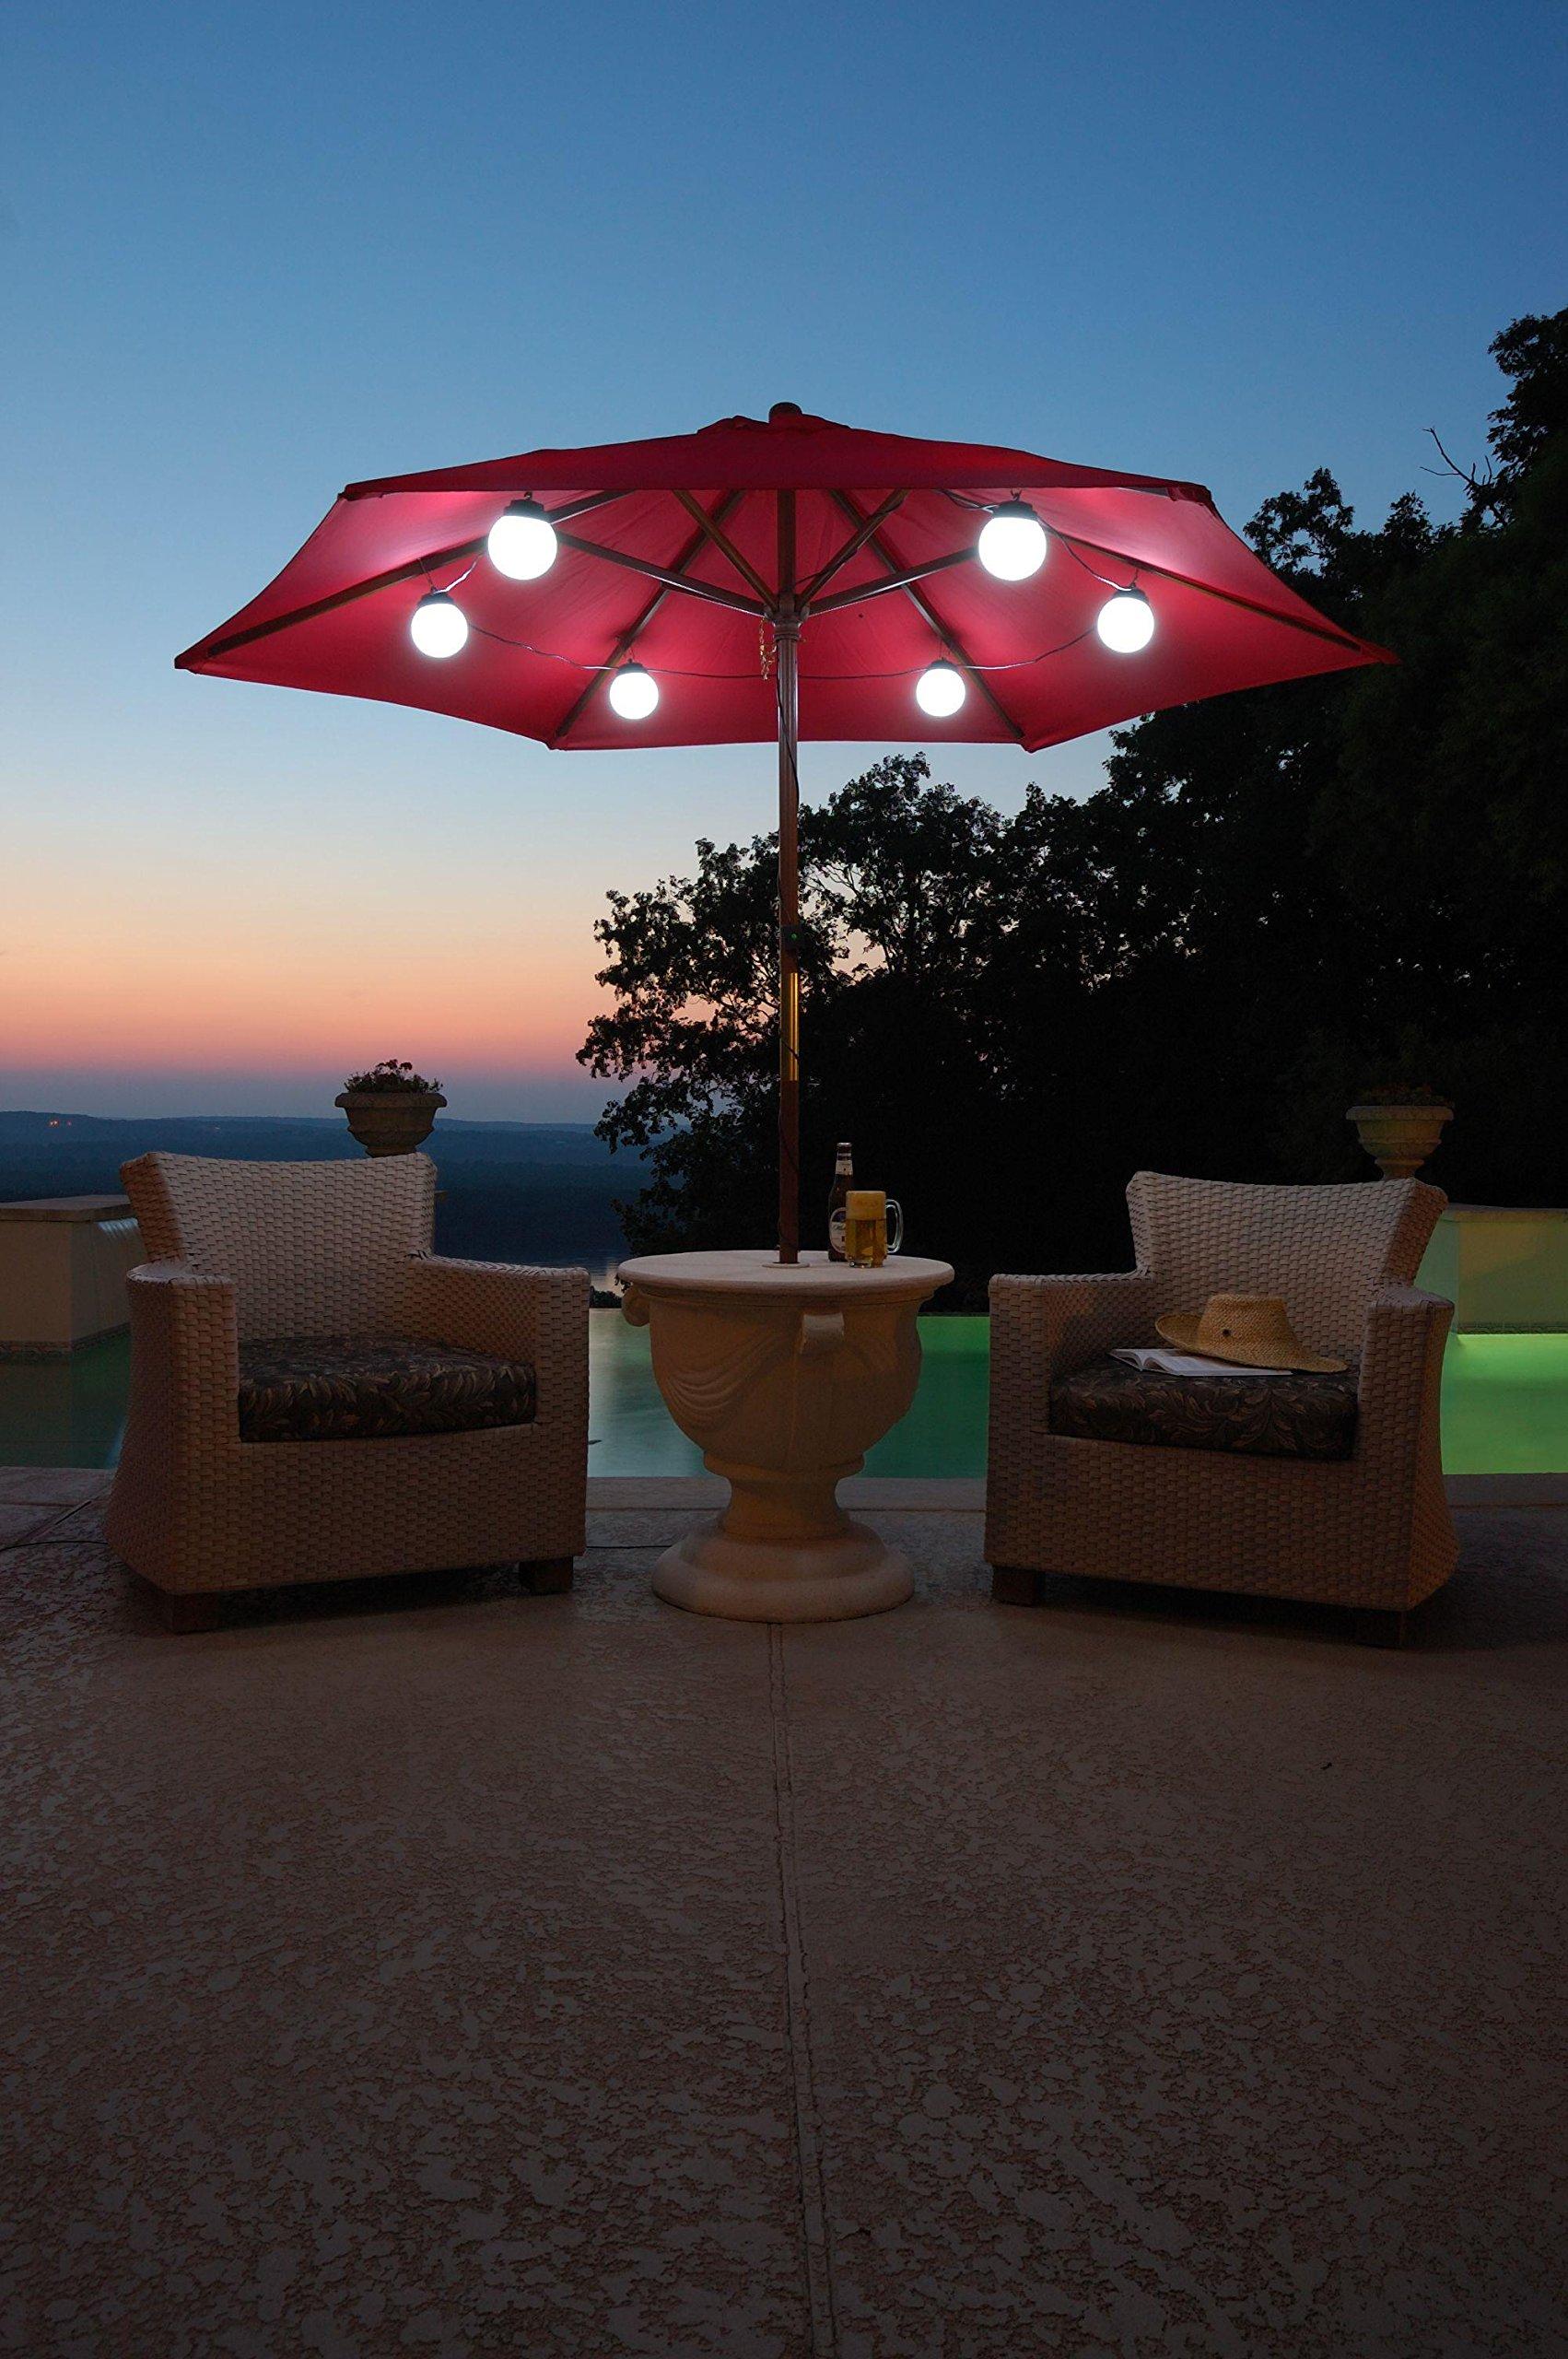 6 Globe Bright White LED SOLAR Powered Umbrella Lights